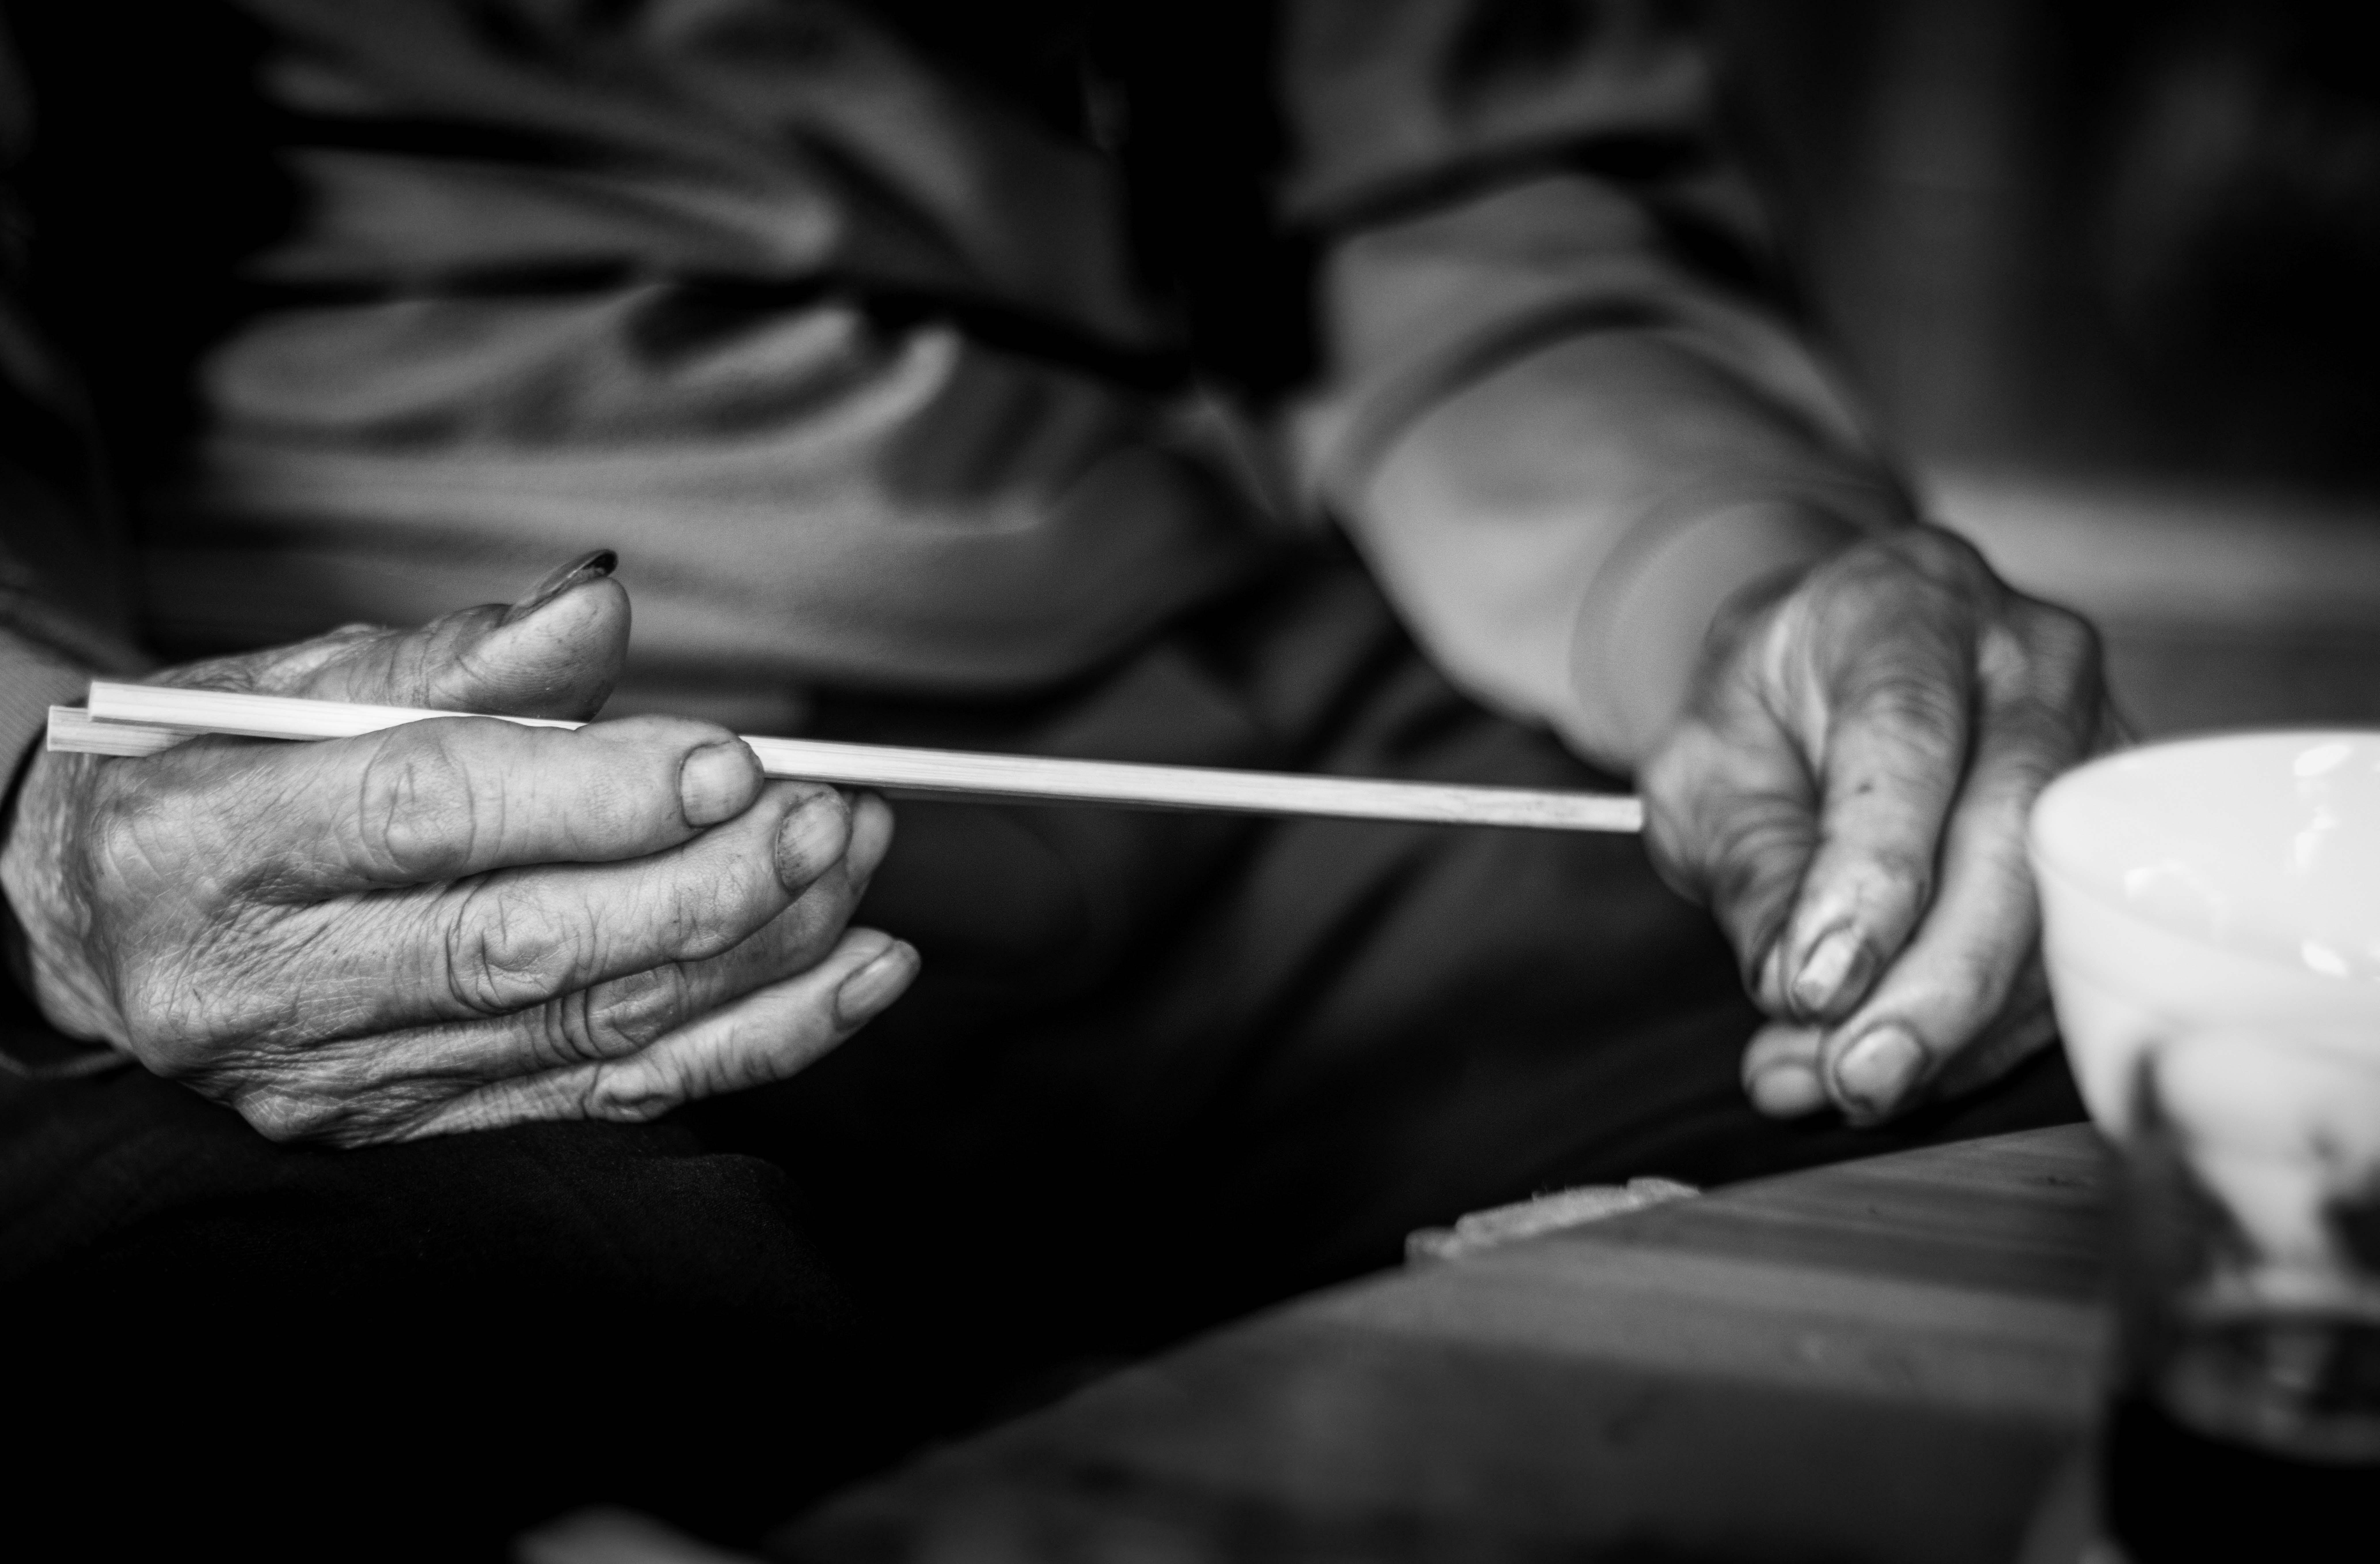 Chopsticks Ed. 1/5